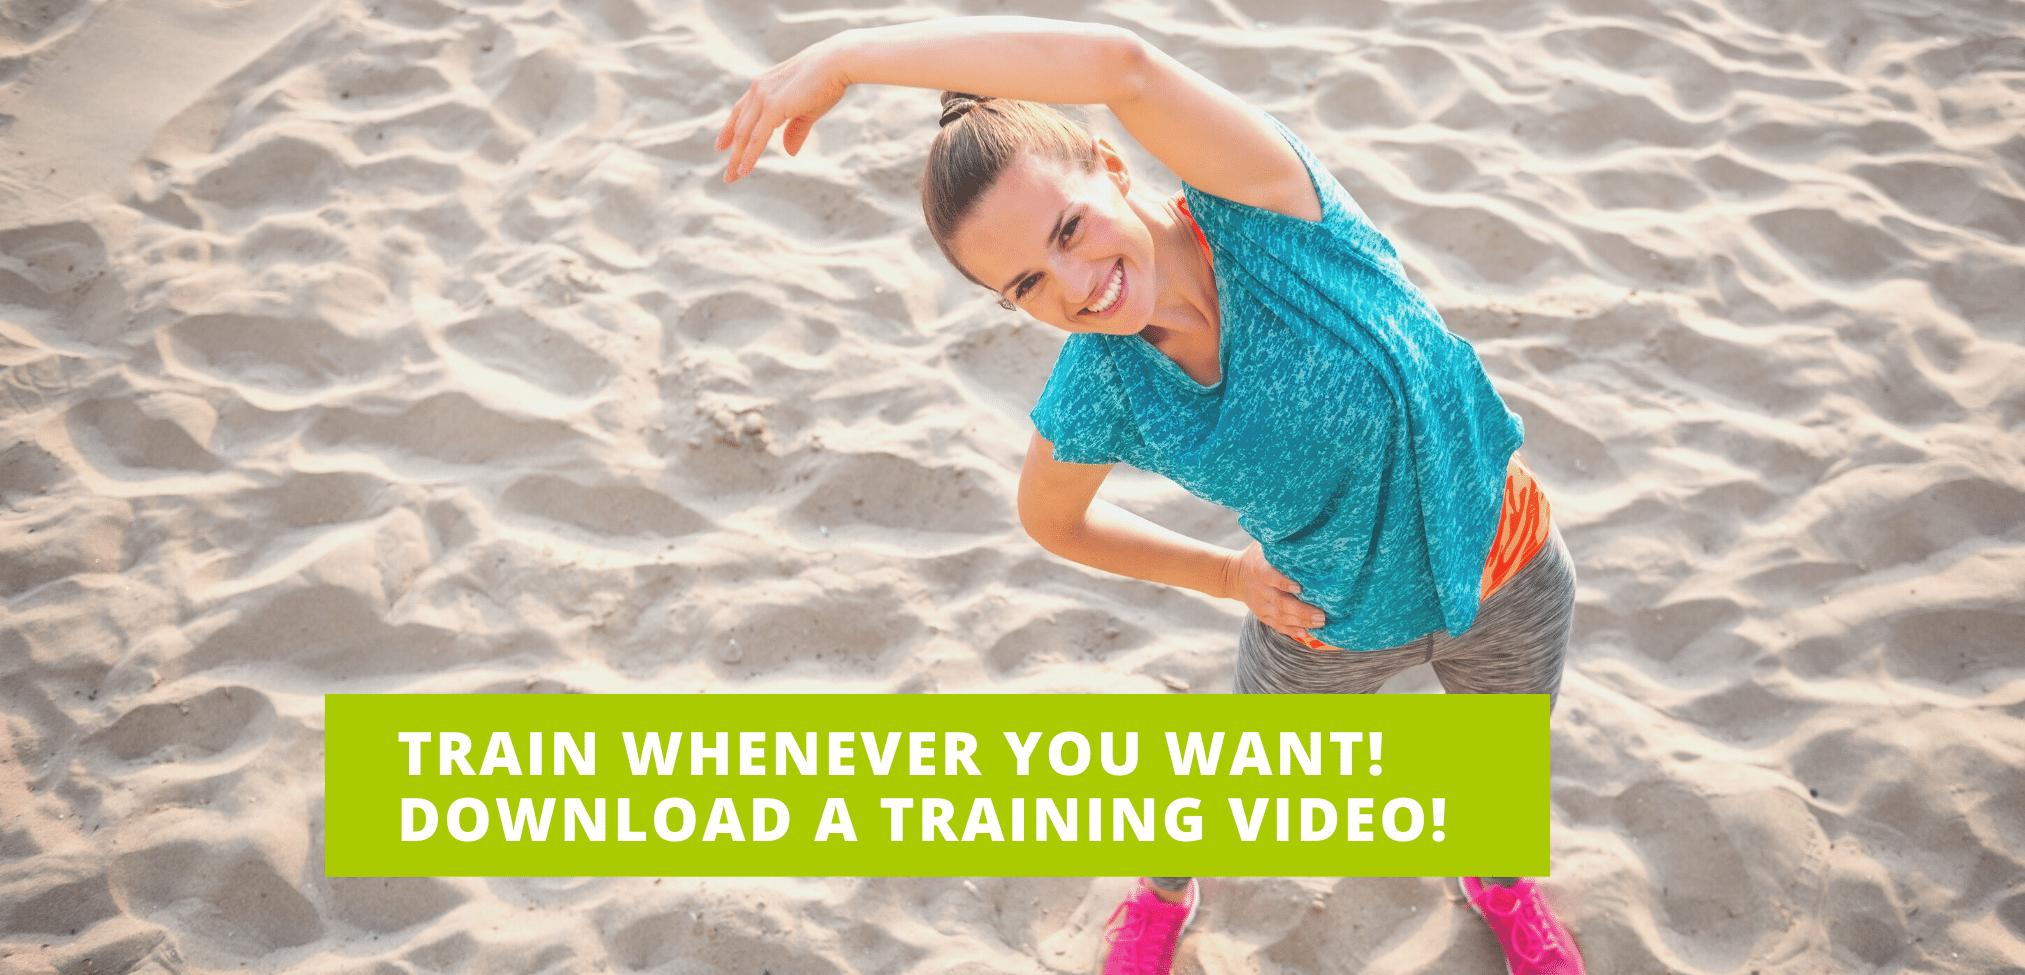 Vita health and fitness video